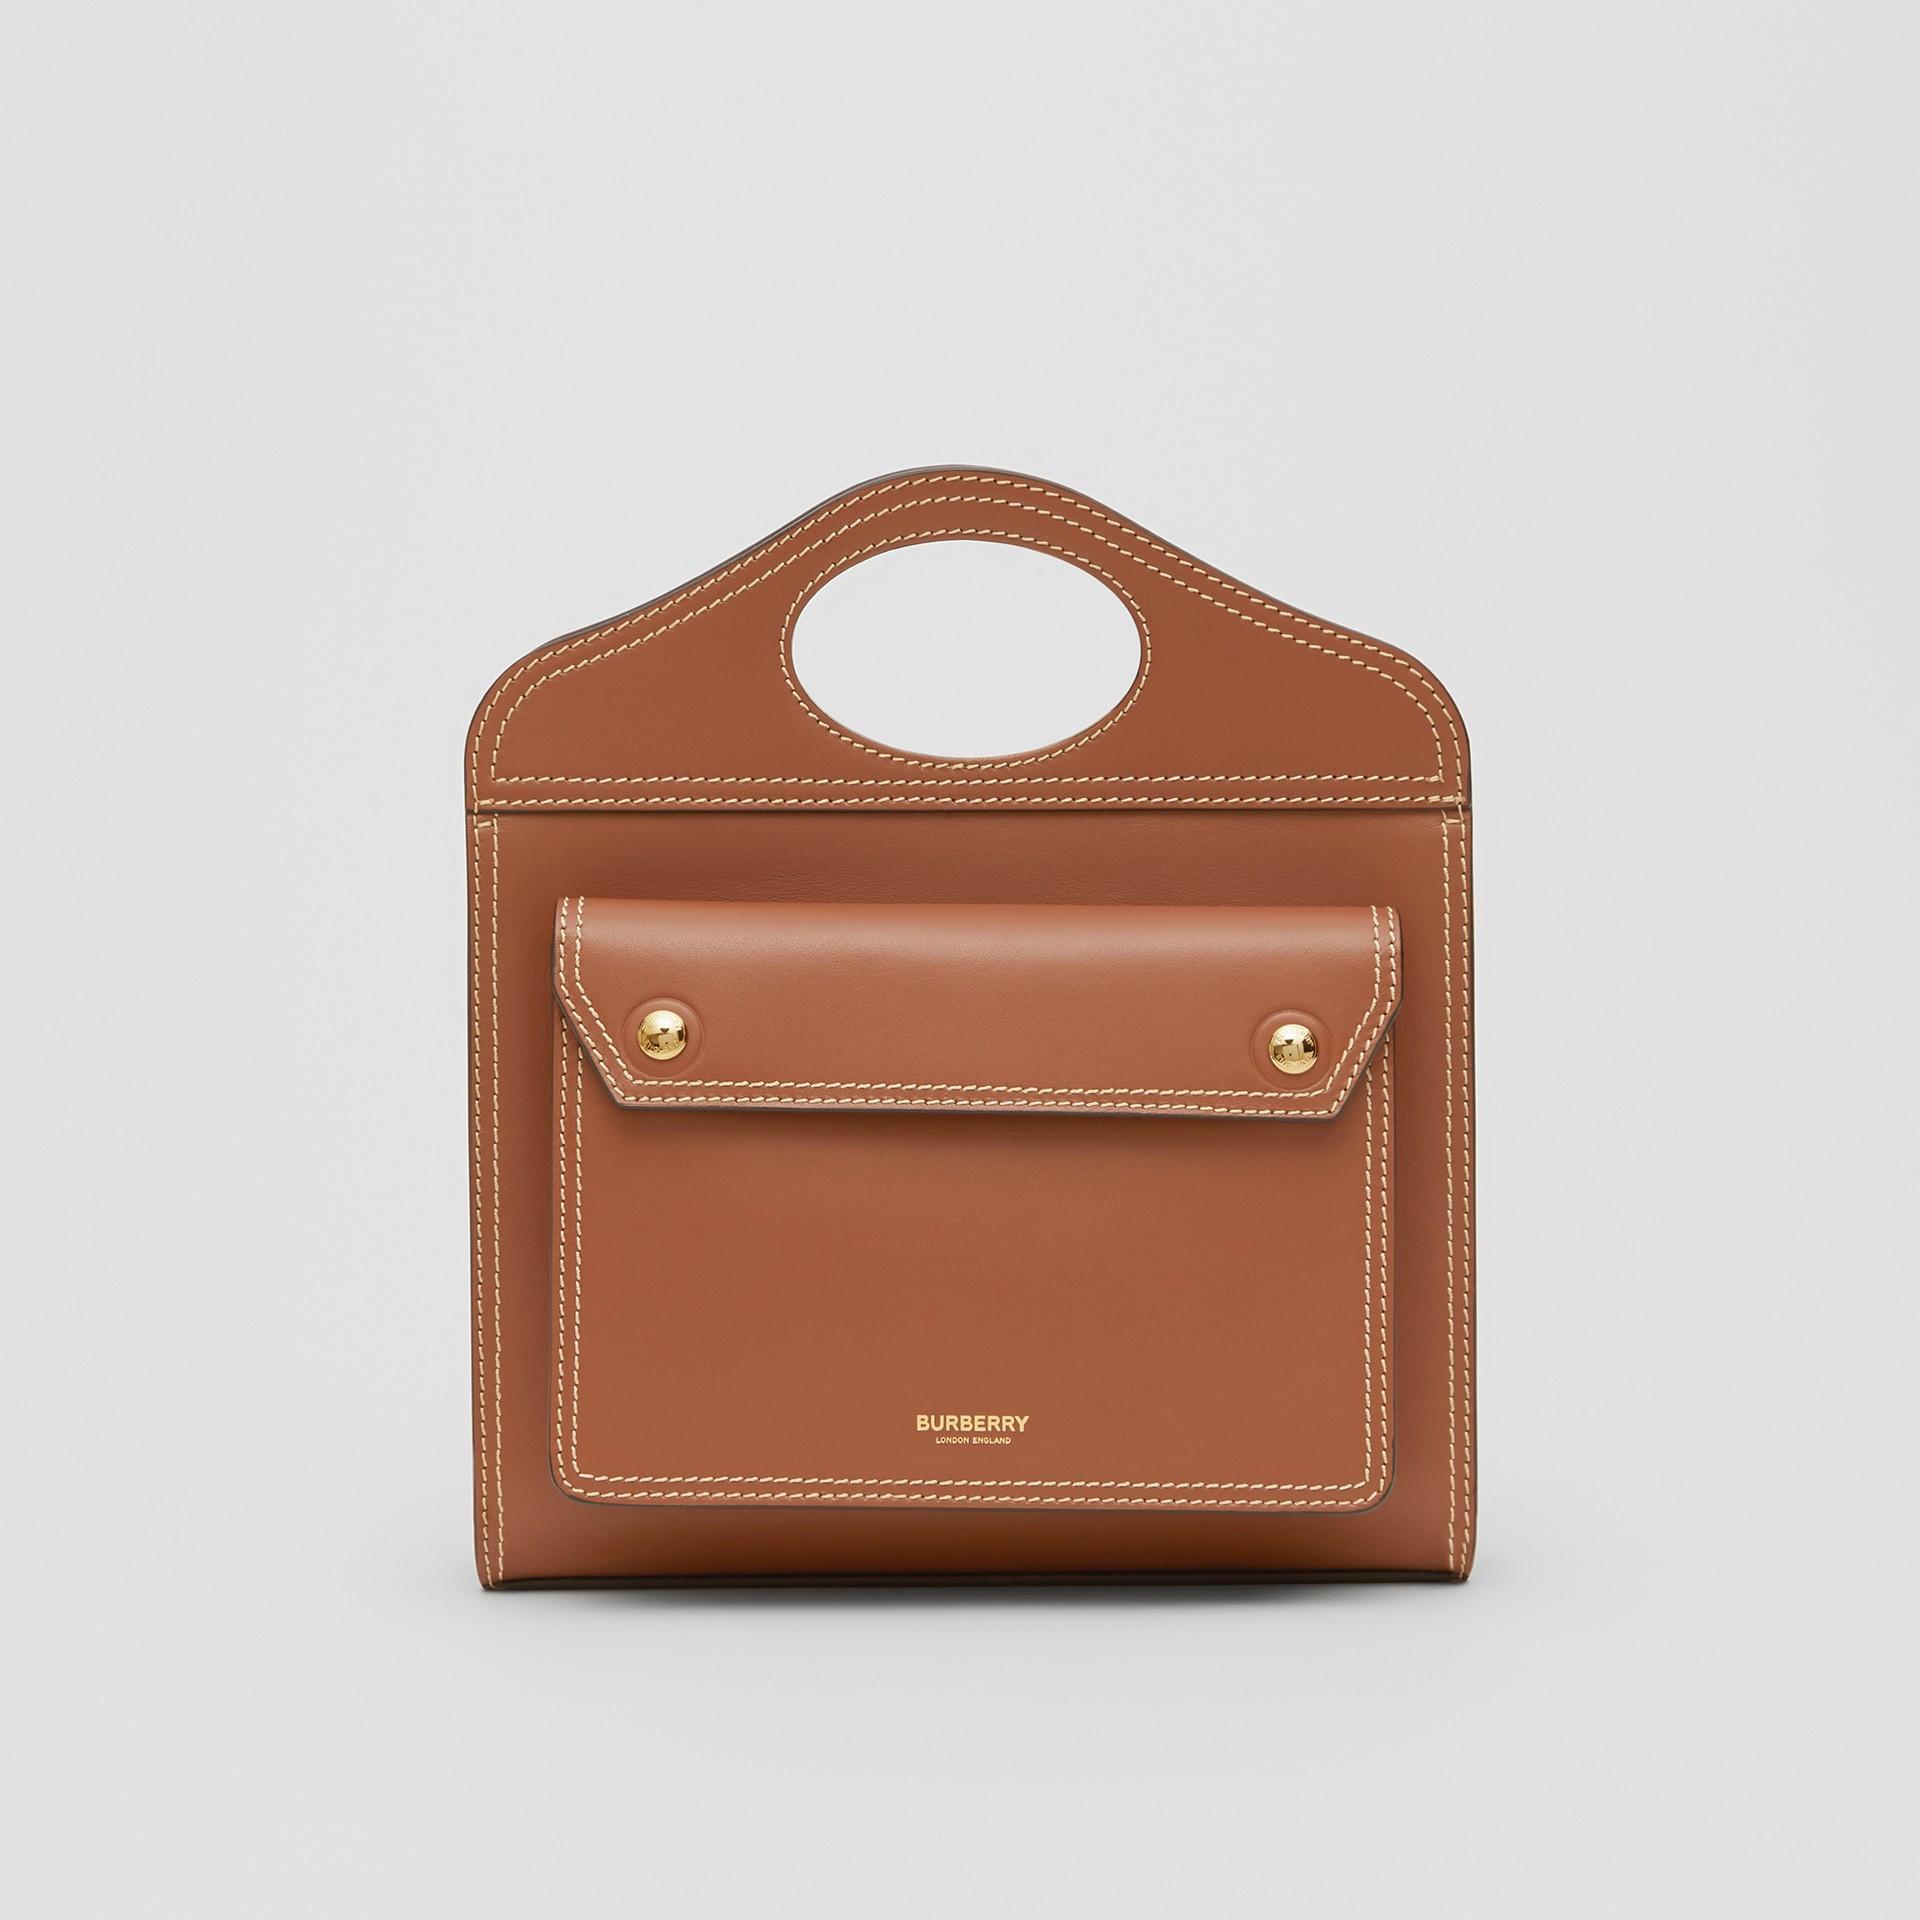 Mini Topstitch Detail Leather Pocket Bag in Malt Brown - Women | Burberry United Kingdom - gallery image 0